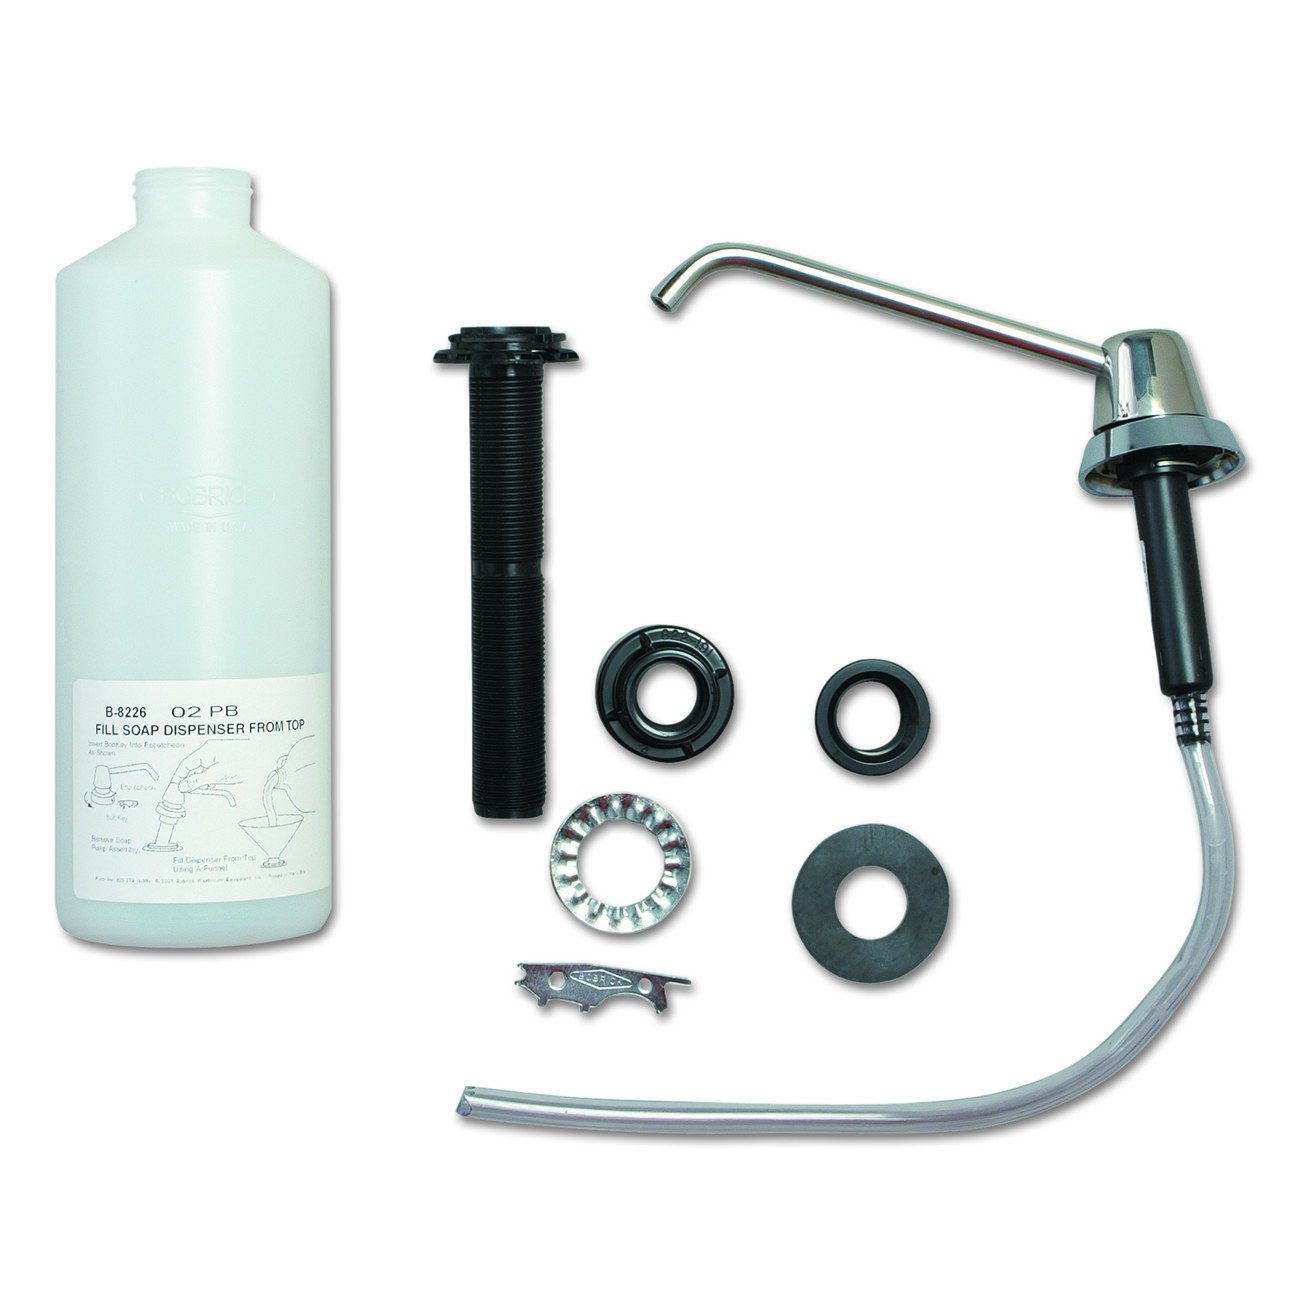 Bobrick B-8226 34 fl oz Capacity, 4'' Thickness Lavatory-Mounted Soap Dispenser